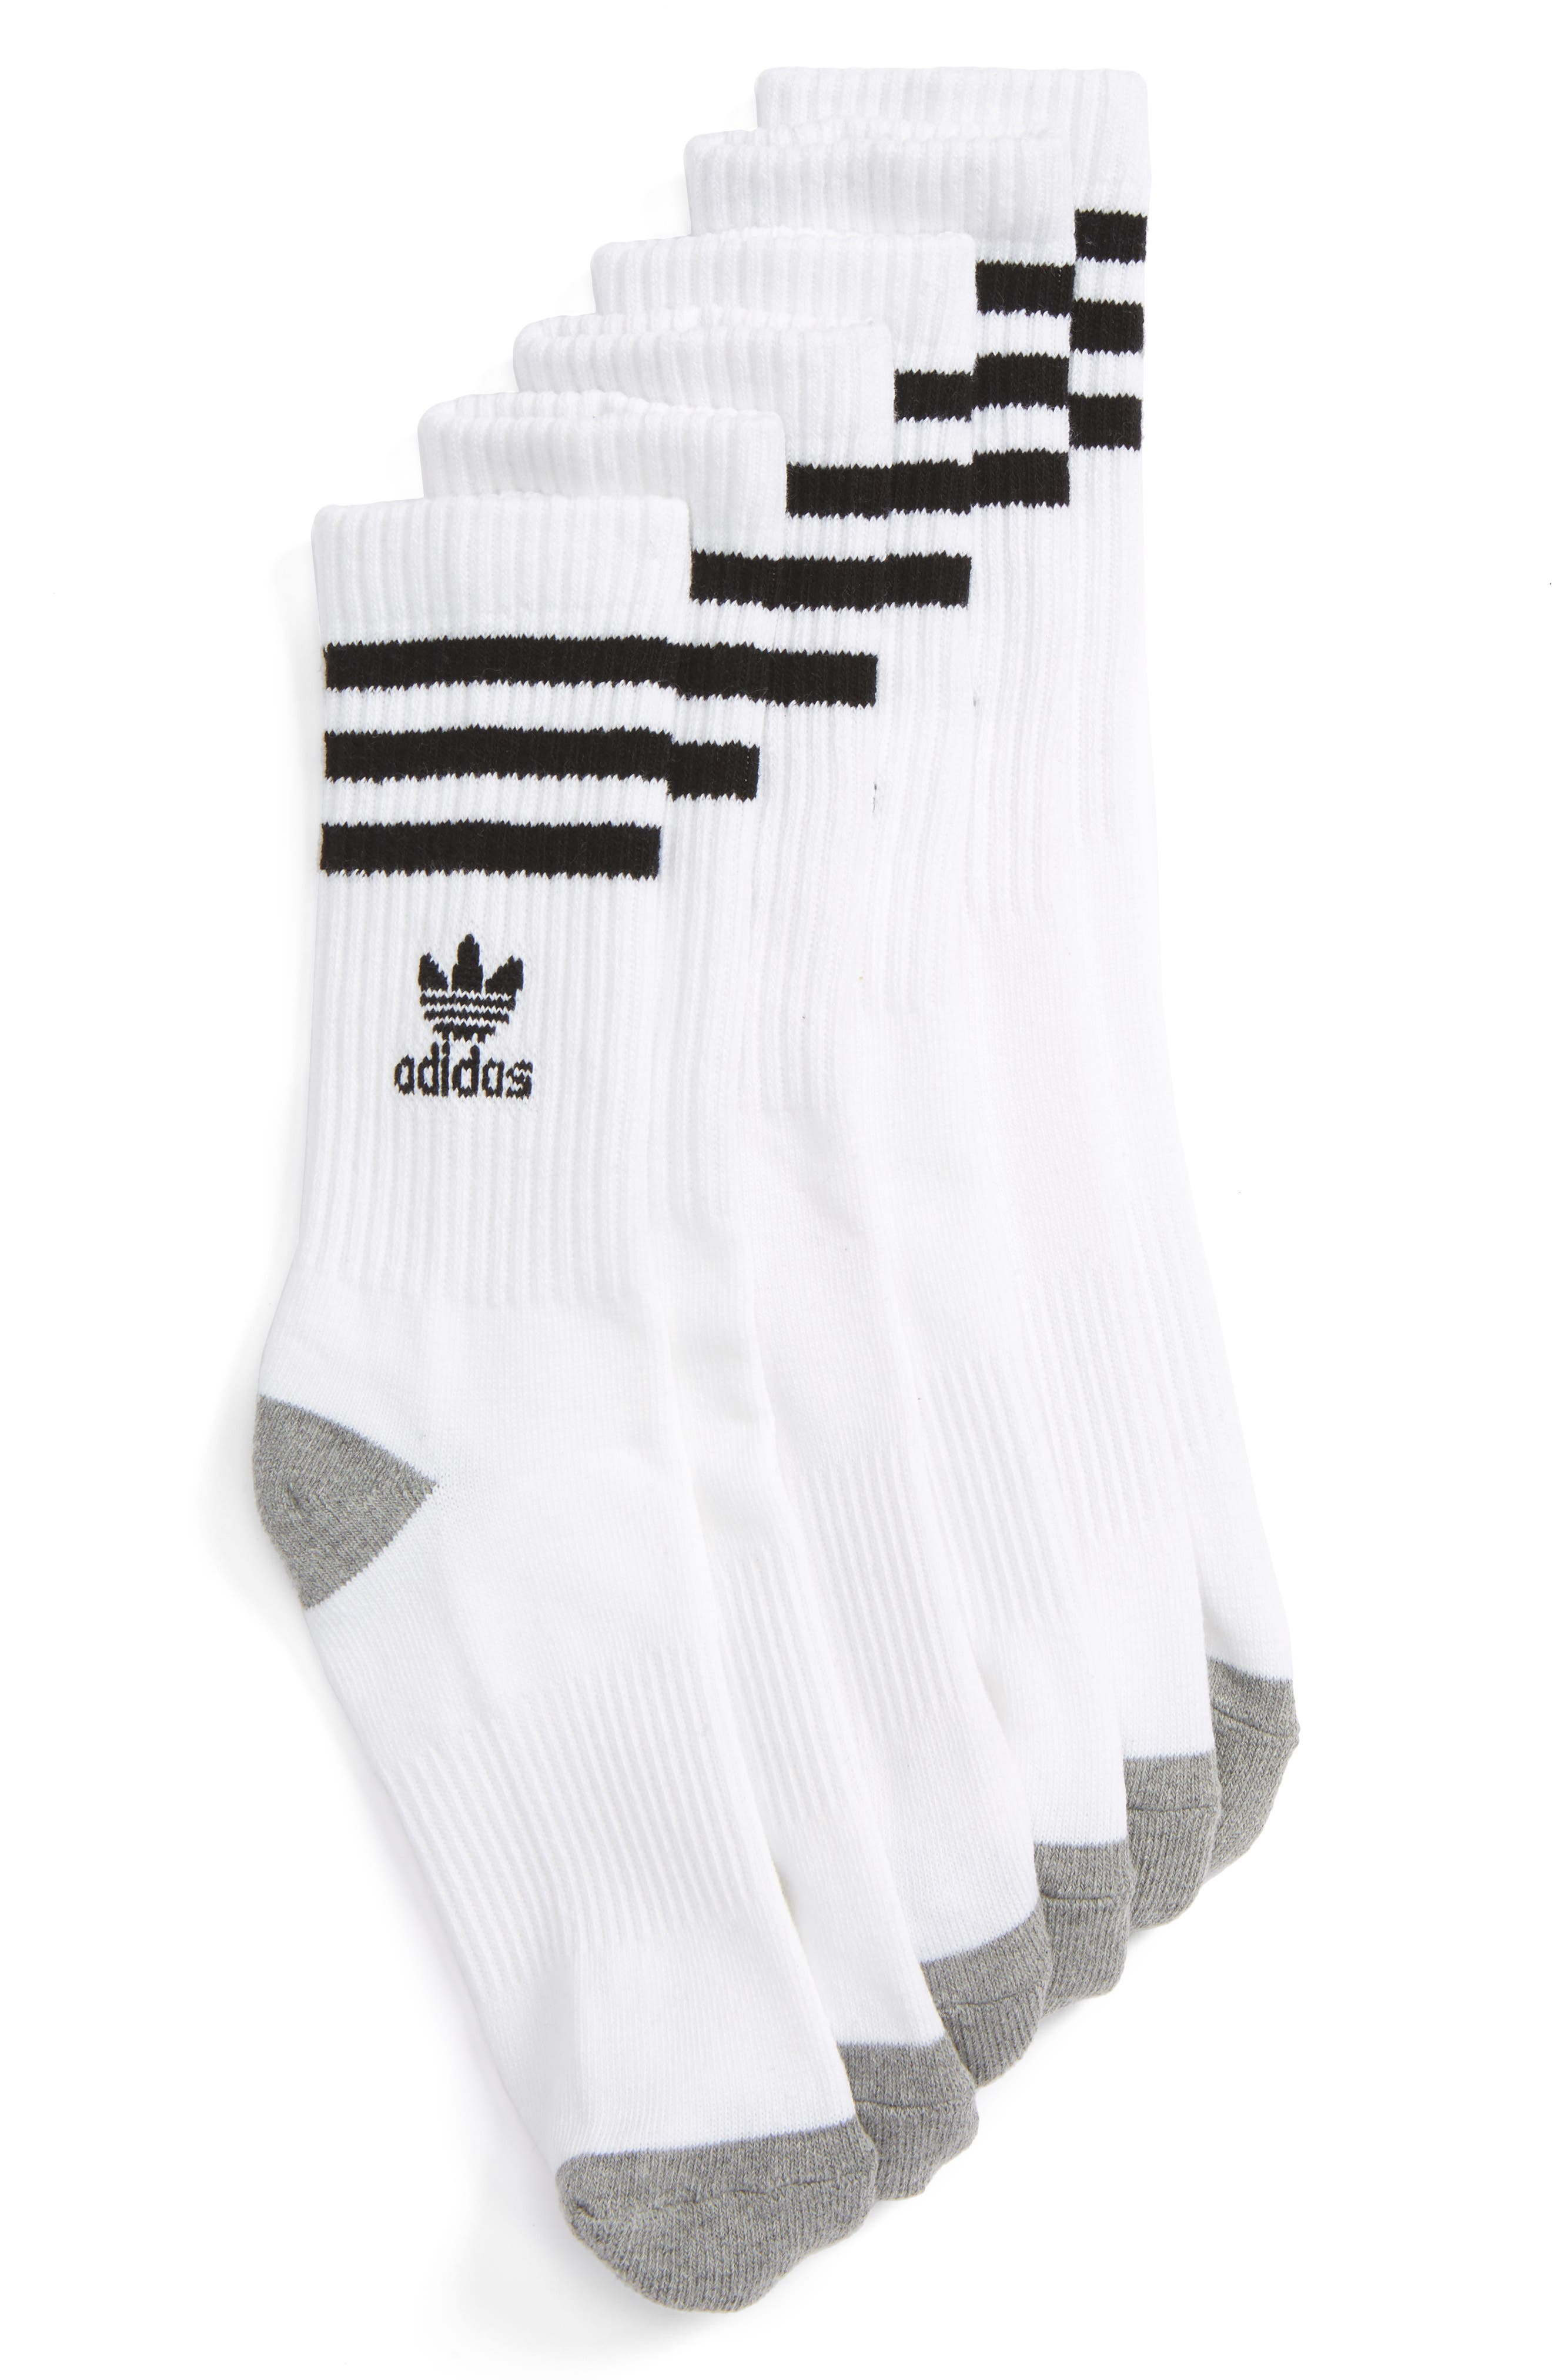 3-Pack Original Cushioned Crew Socks,                             Main thumbnail 1, color,                             White/ Black/ White